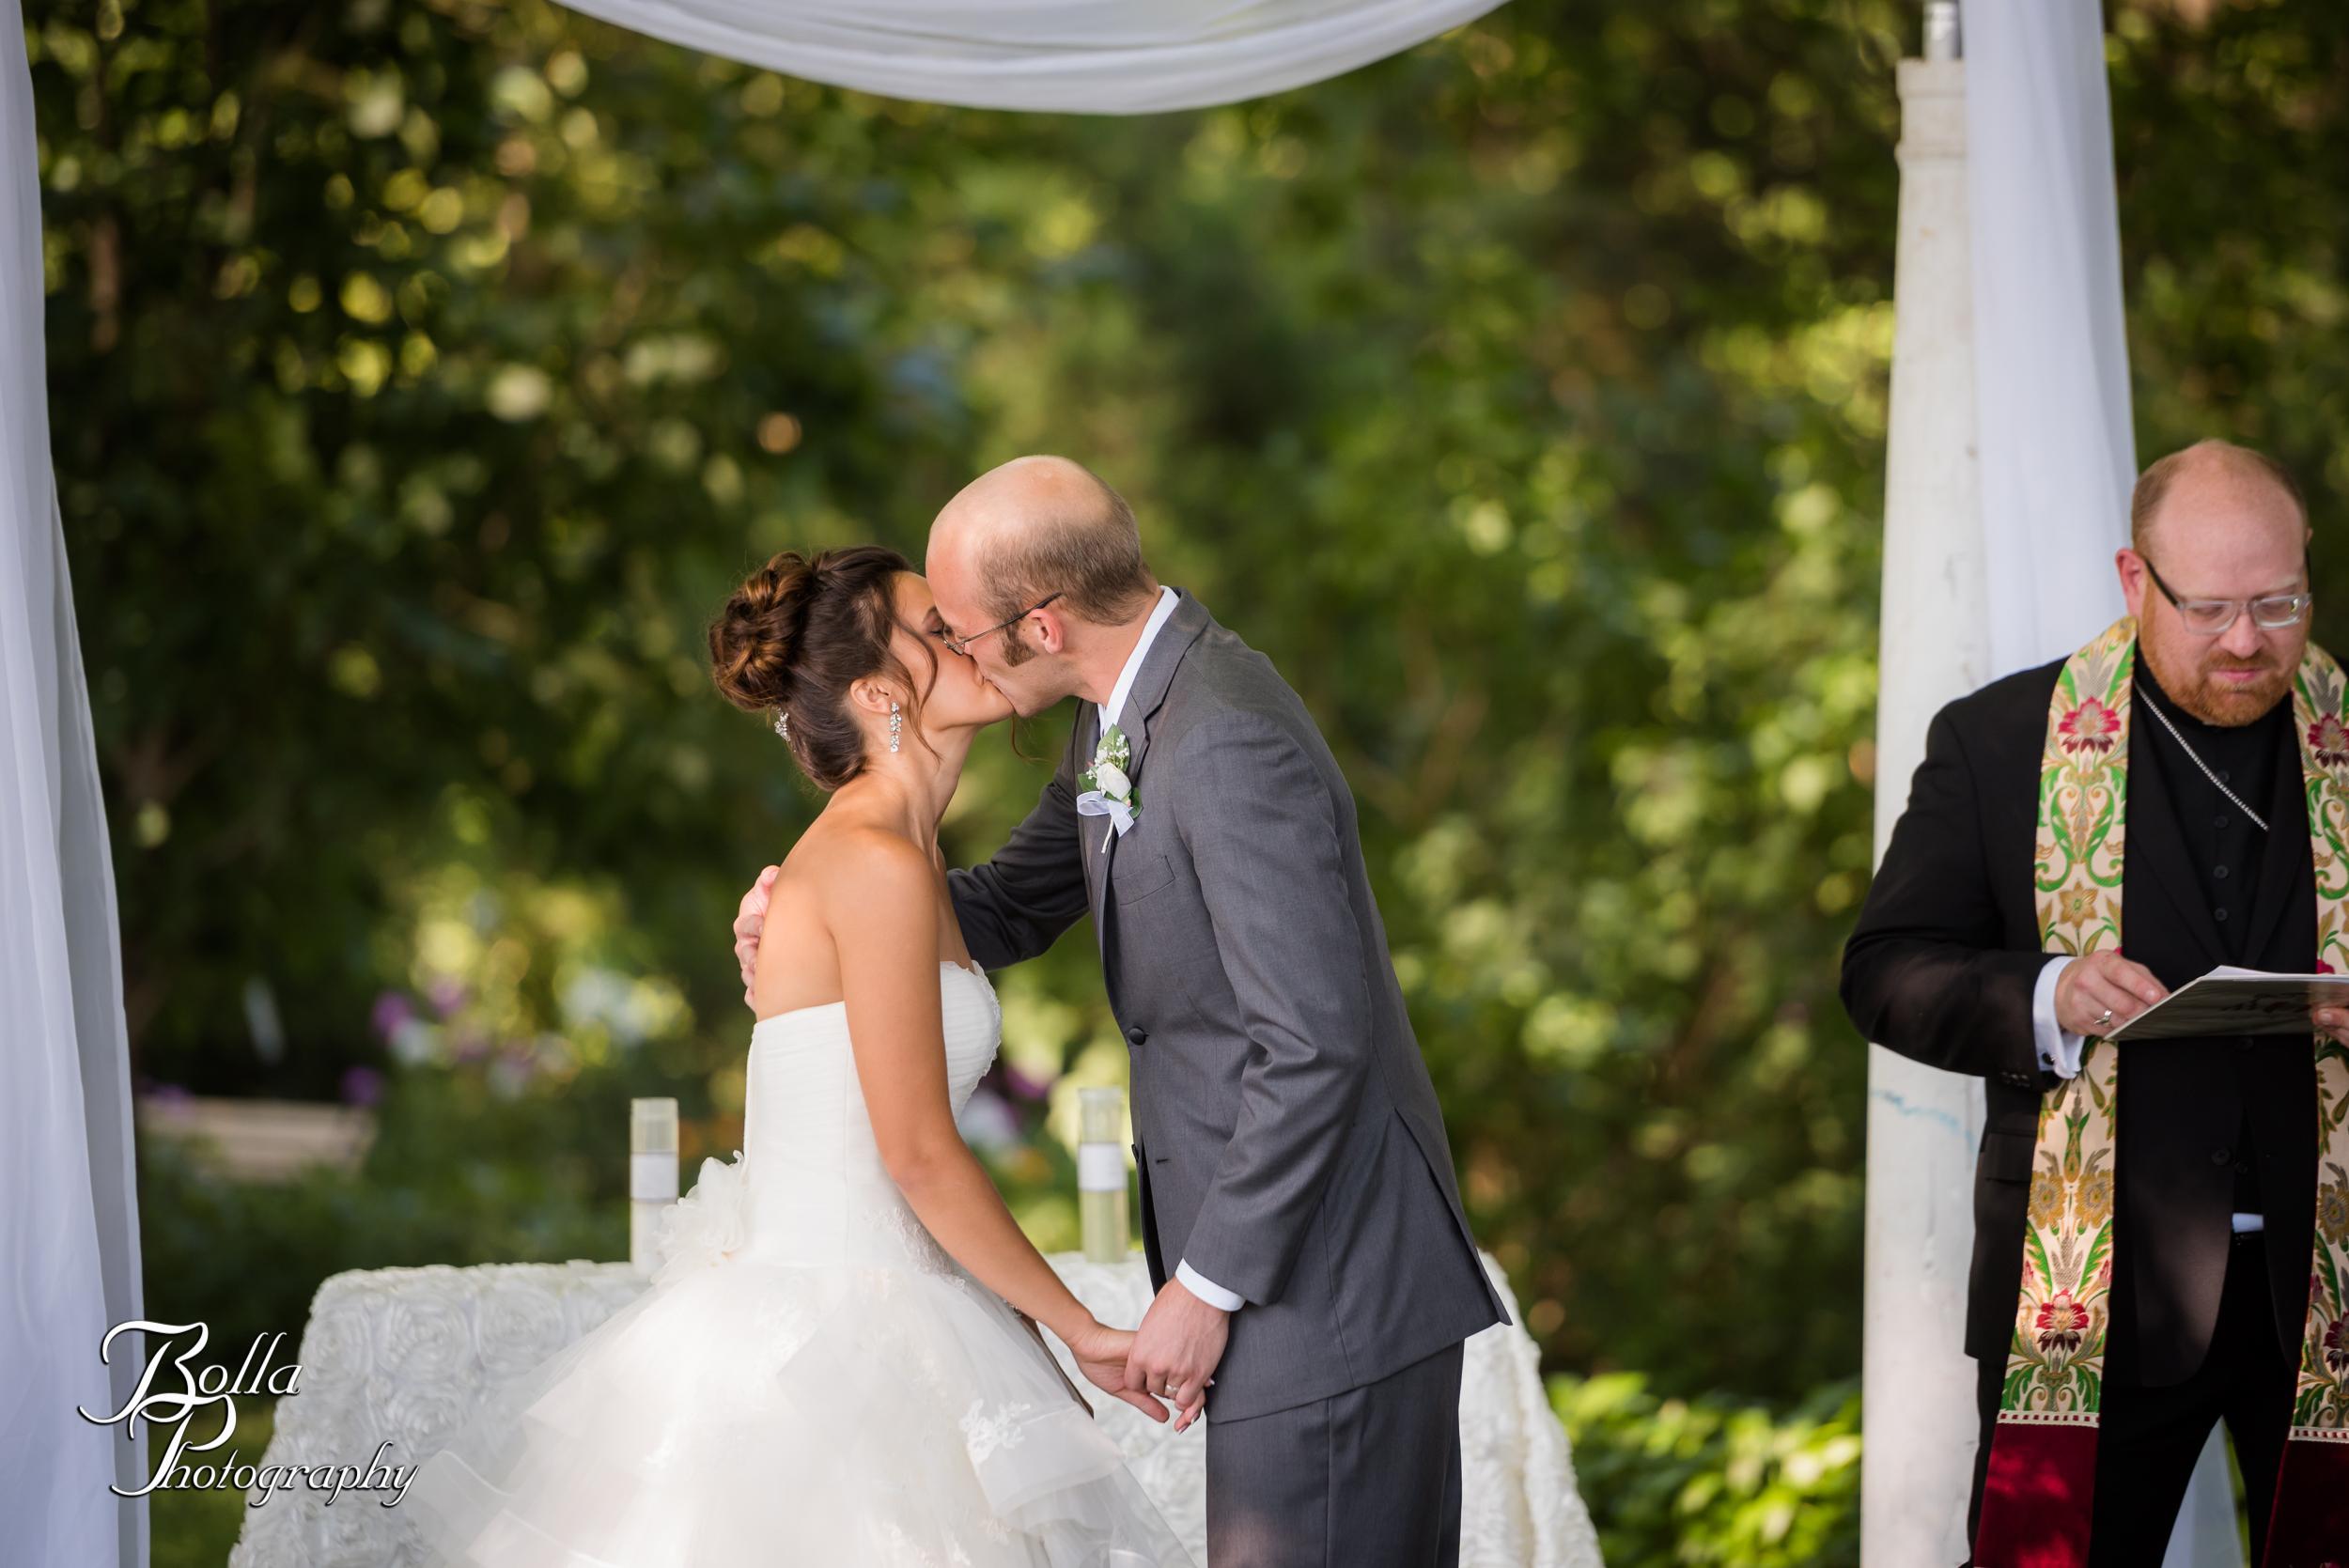 Bolla_photography_edwardsville_wedding_photographer_st_louis_weddings_Highland_outdoor_ceremony_Louis_Latzer_Homestead_Theims-0249.jpg